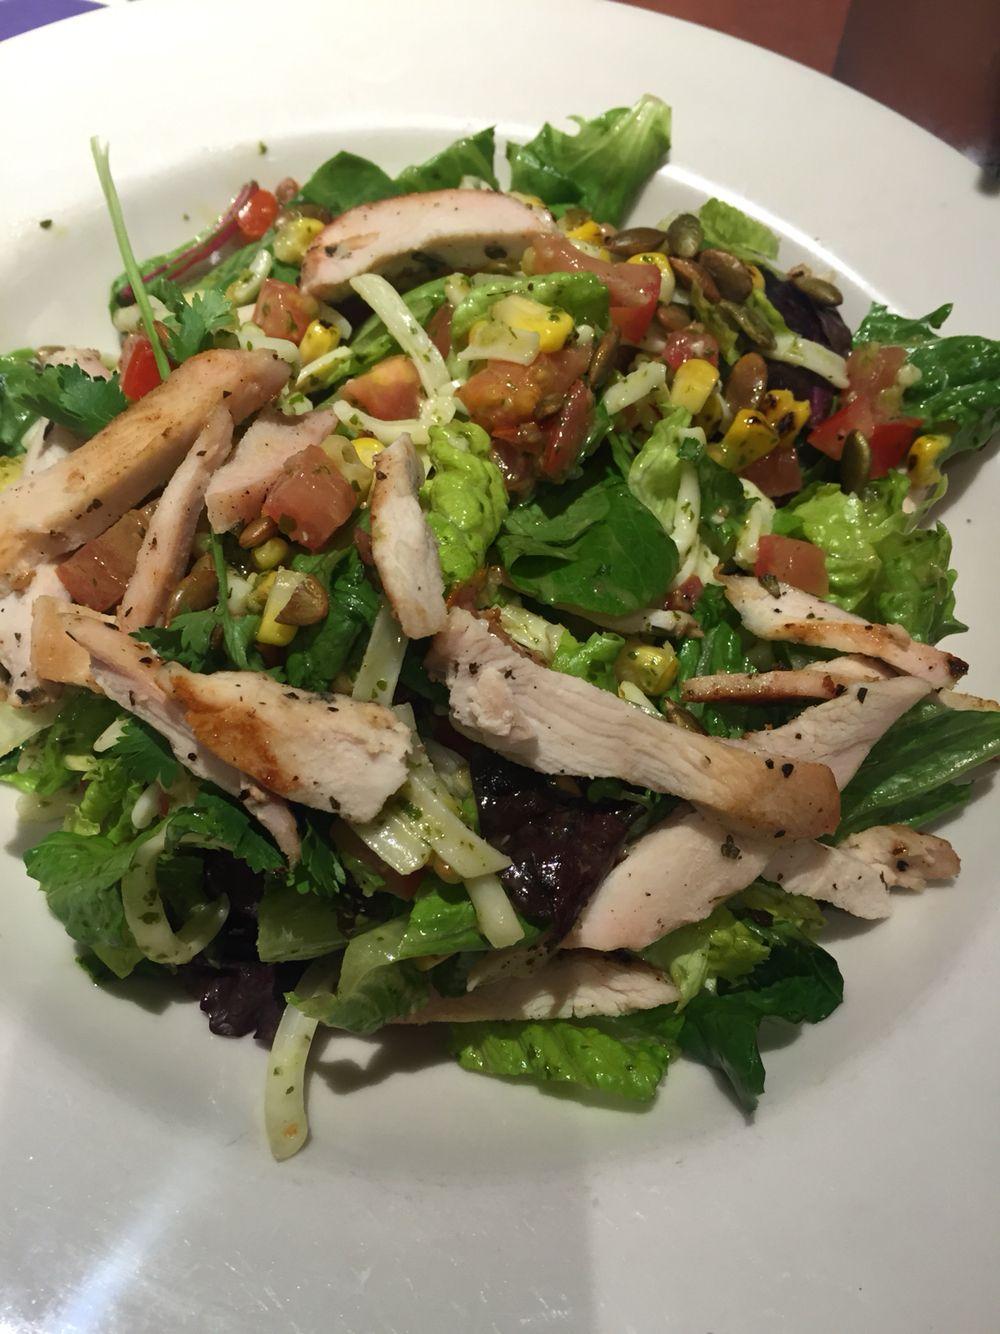 Grilled ck salad w/cilantro dressing.